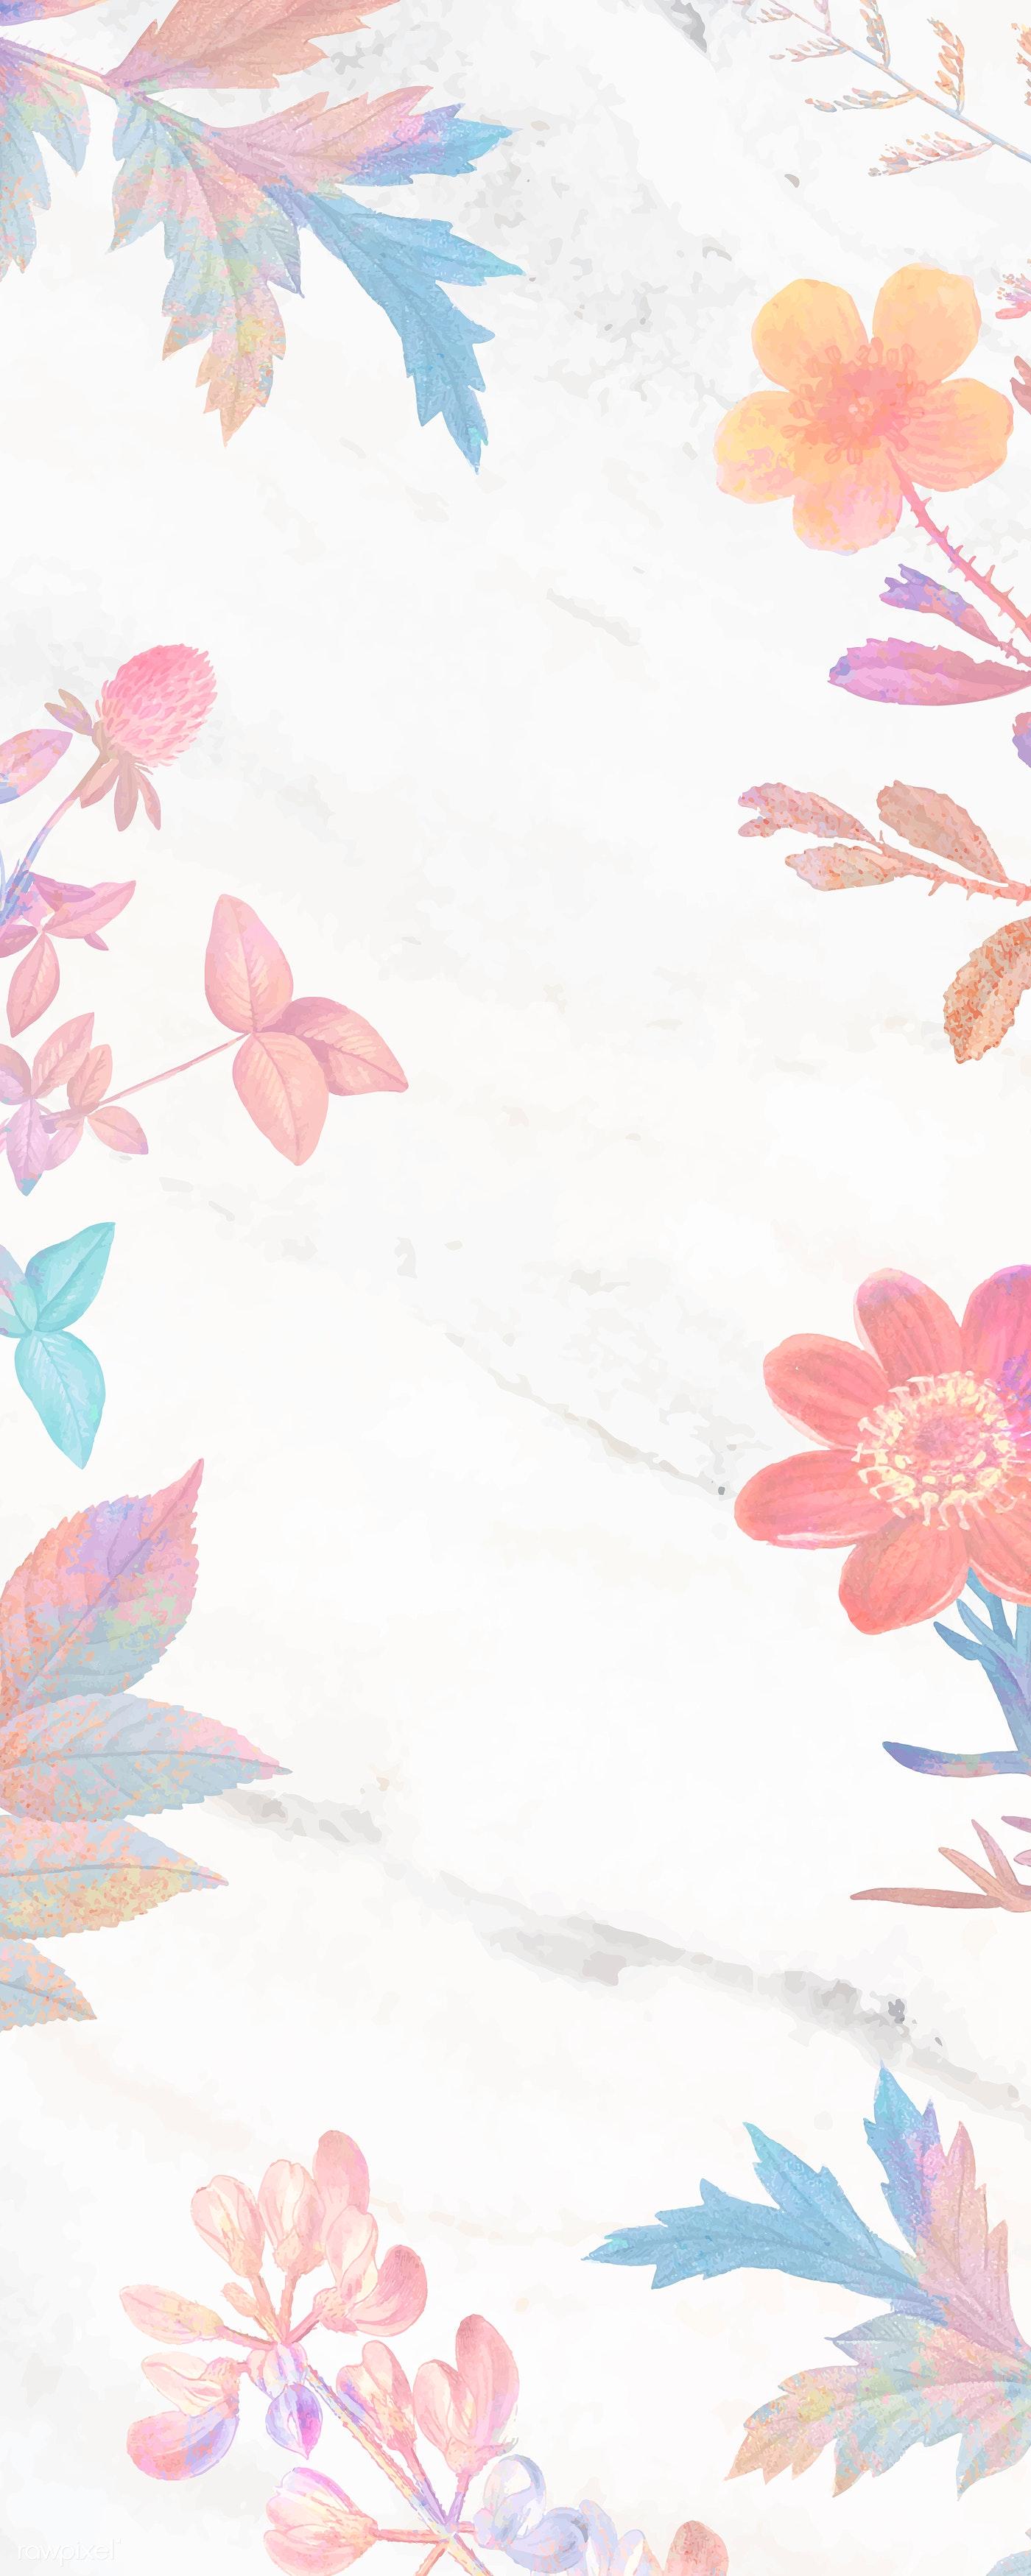 Pink Flower Pinterest Banner Royalty Free Stock Illustration